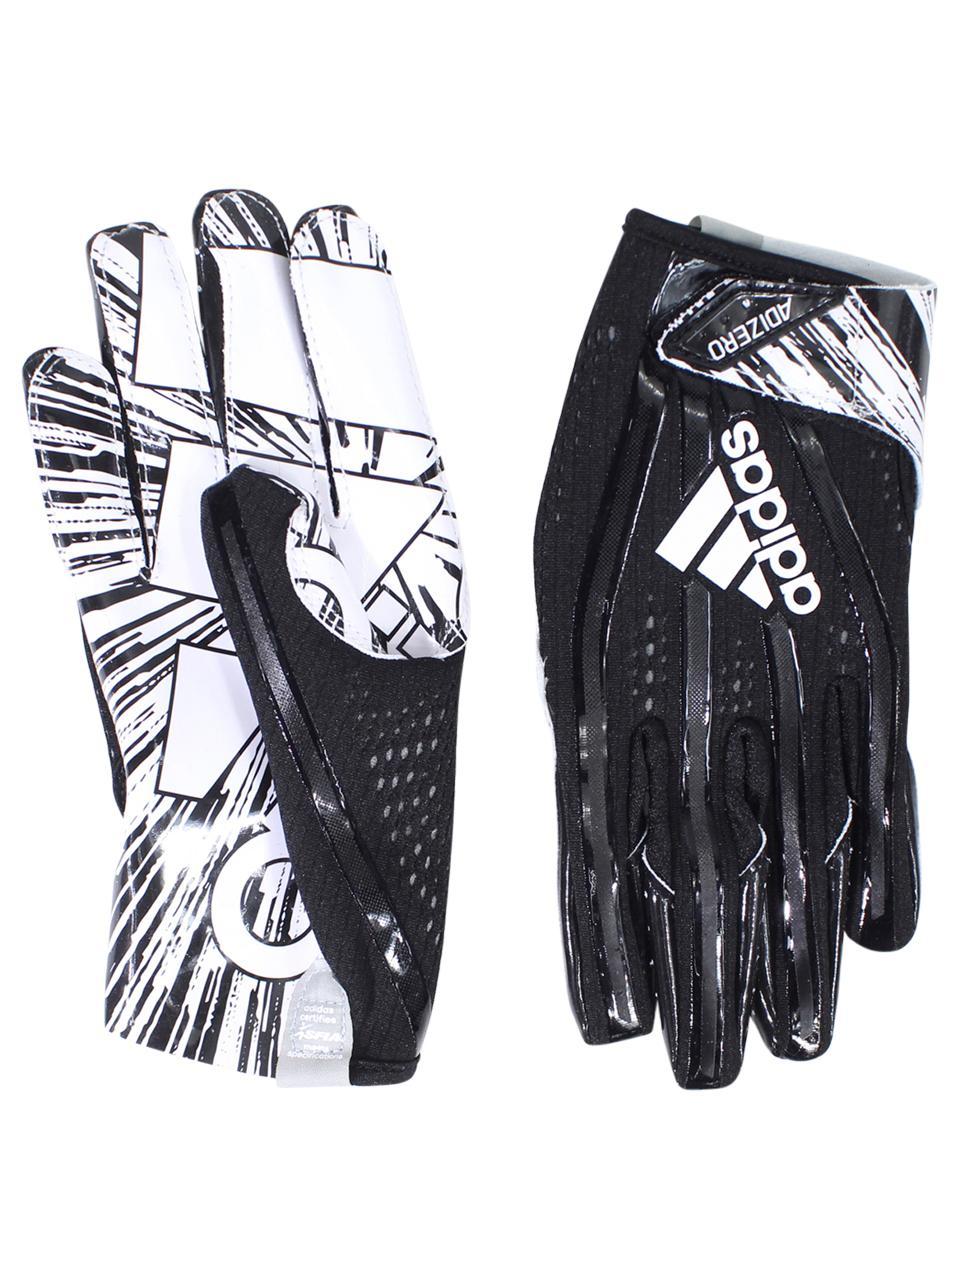 Adizero-5-Star-7.0 Football Gloves